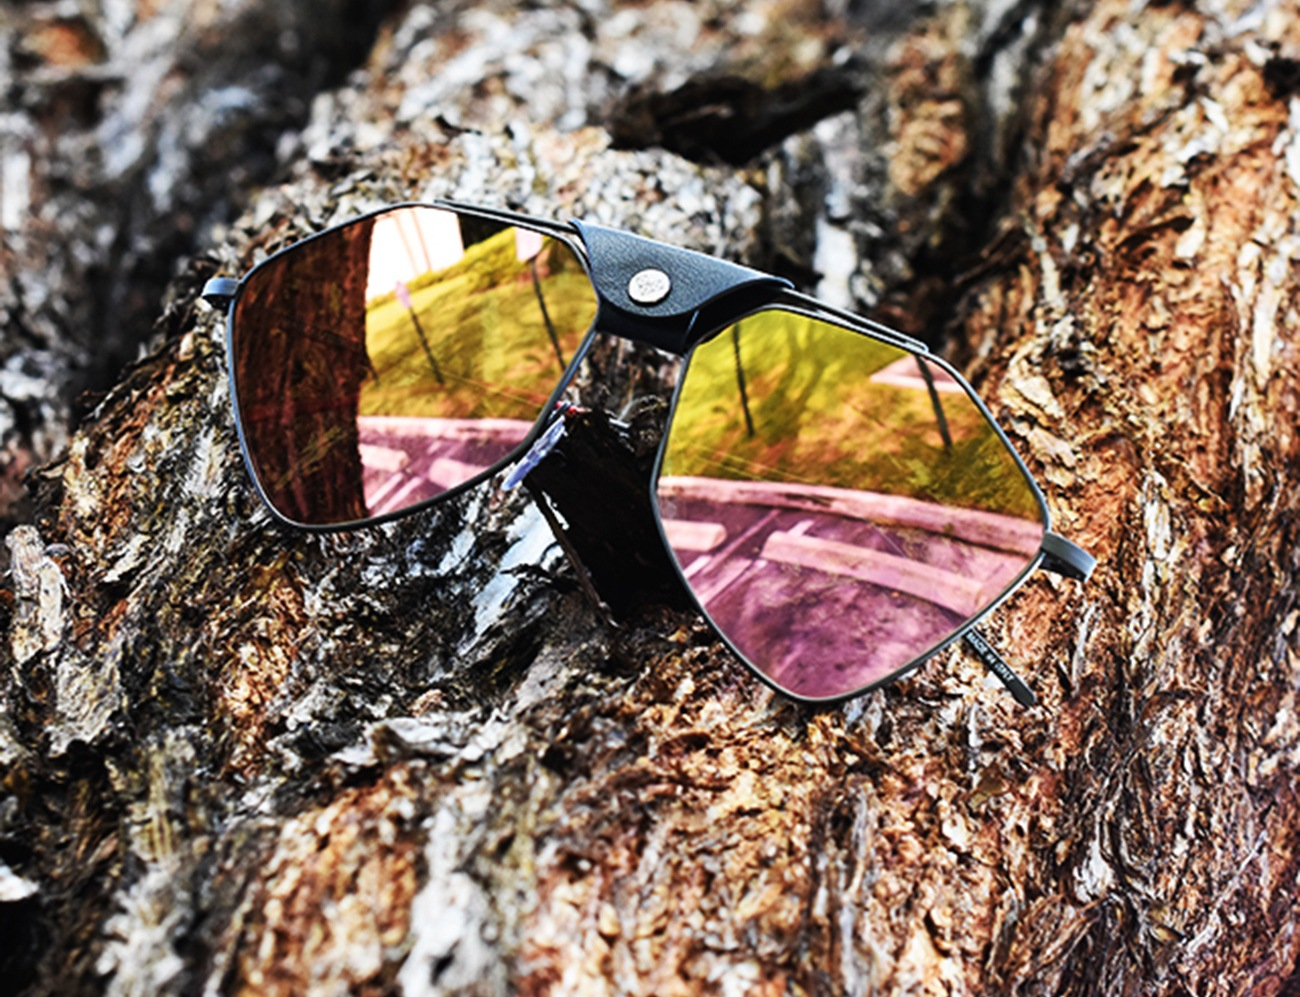 Vysen Eyewear – Retro Styled Handmade Frames